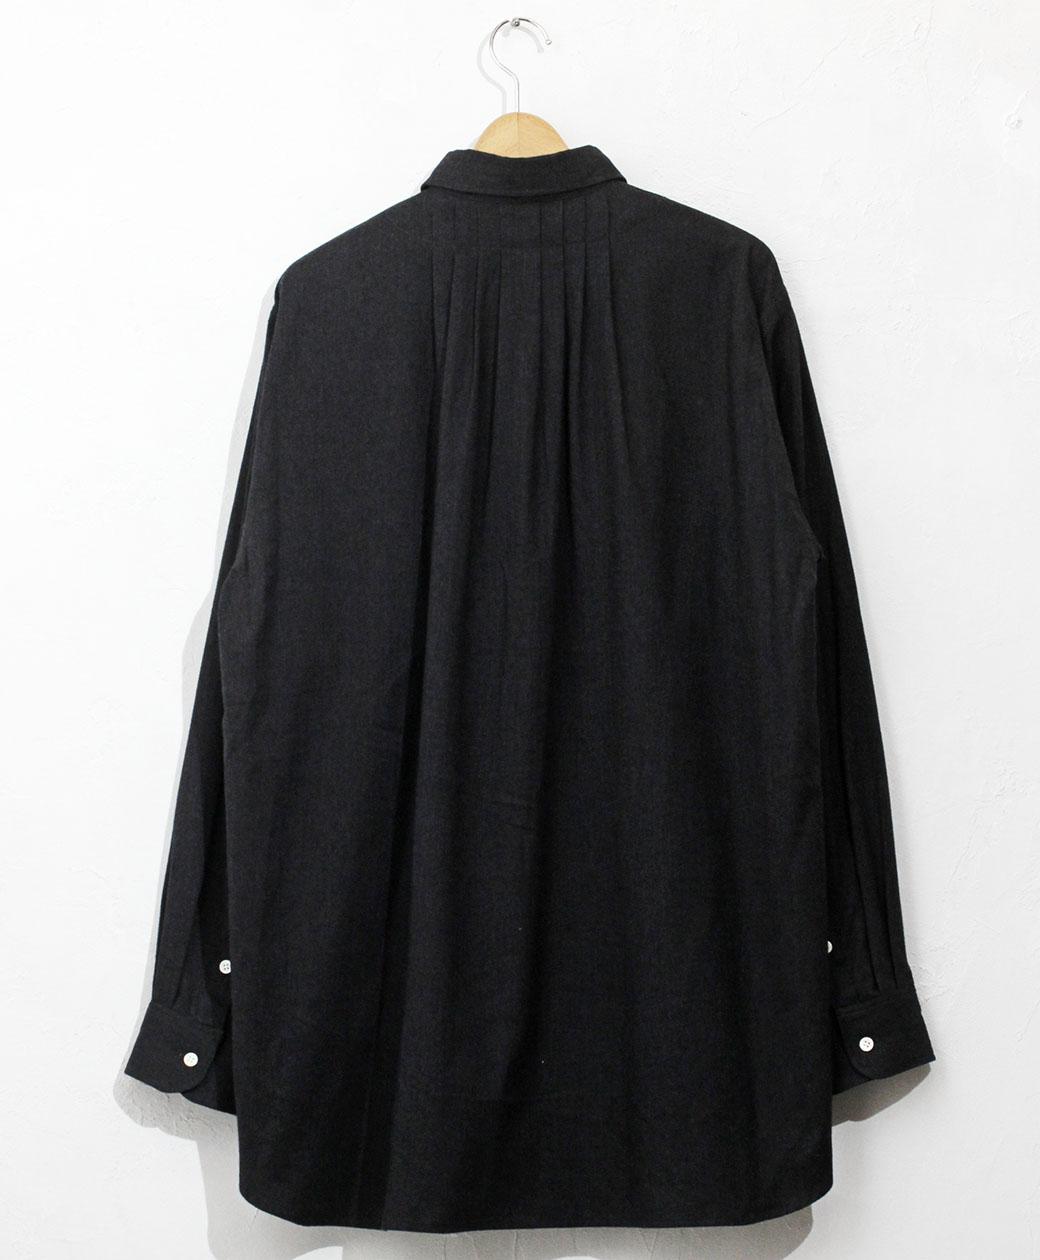 SUNNY ELEMENT Sleeping Shirt(Charcoal Herringbone)